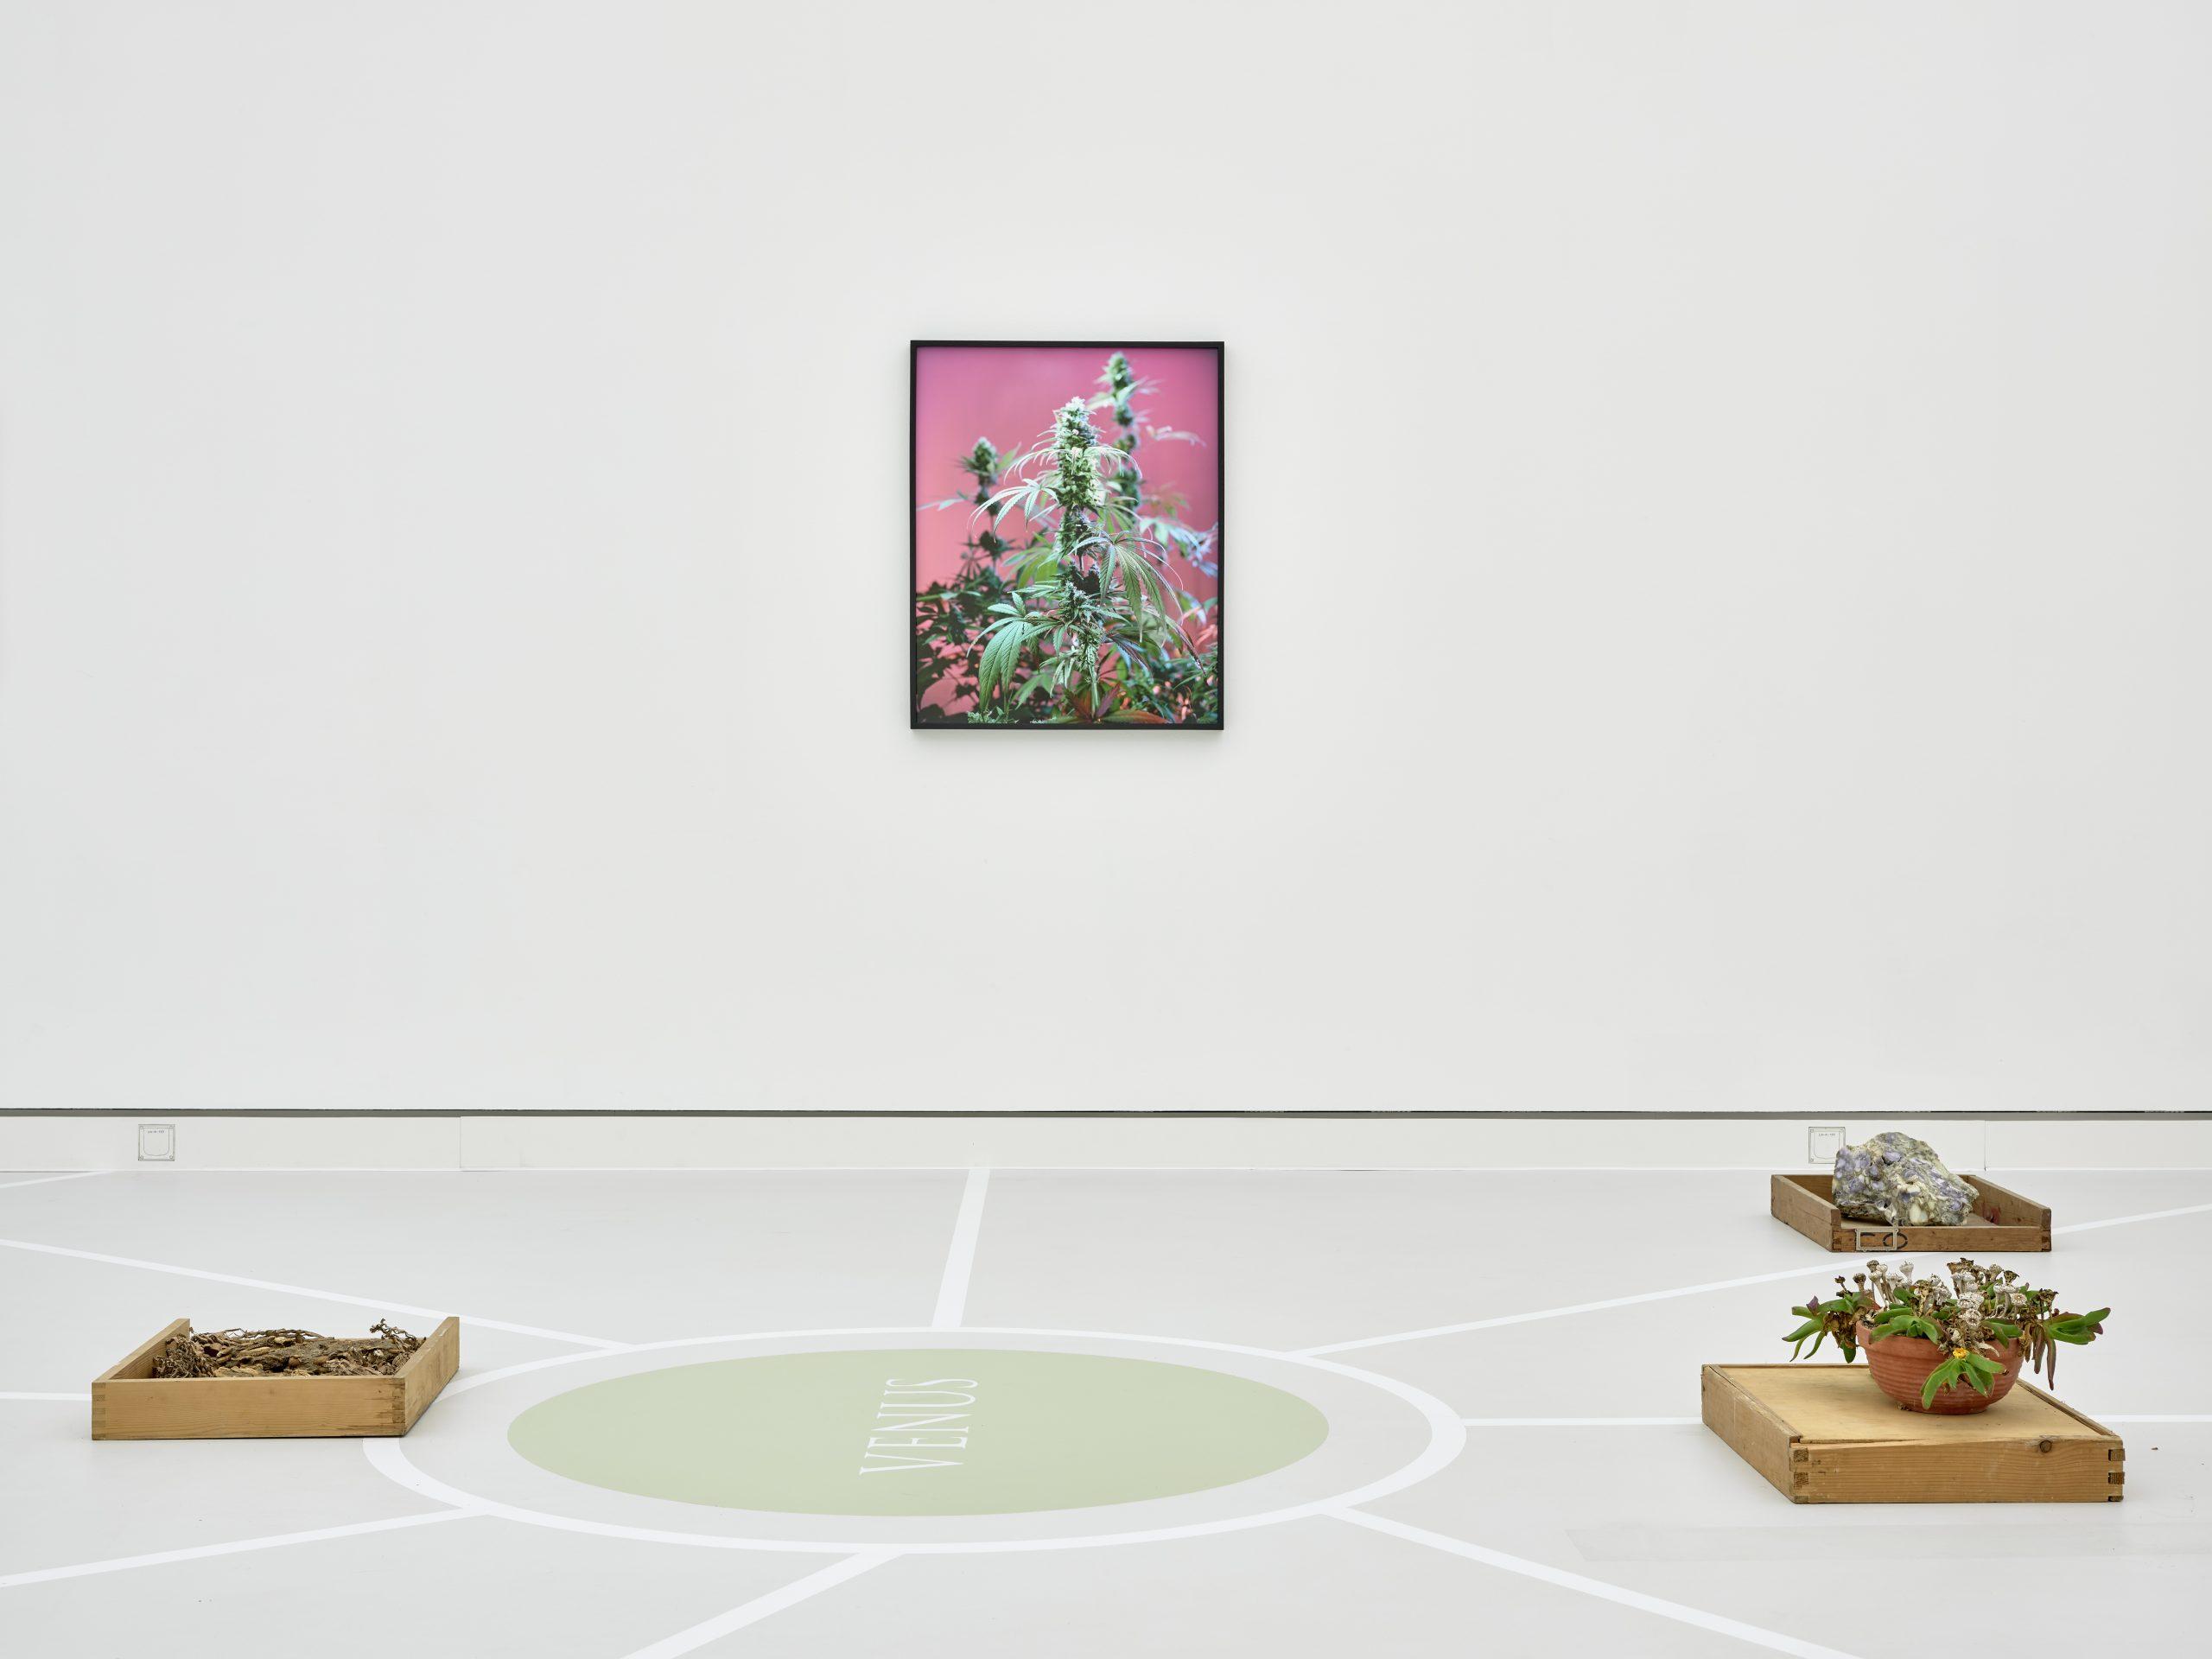 Joachim Koester, Kunsthalle Mainz, 2020